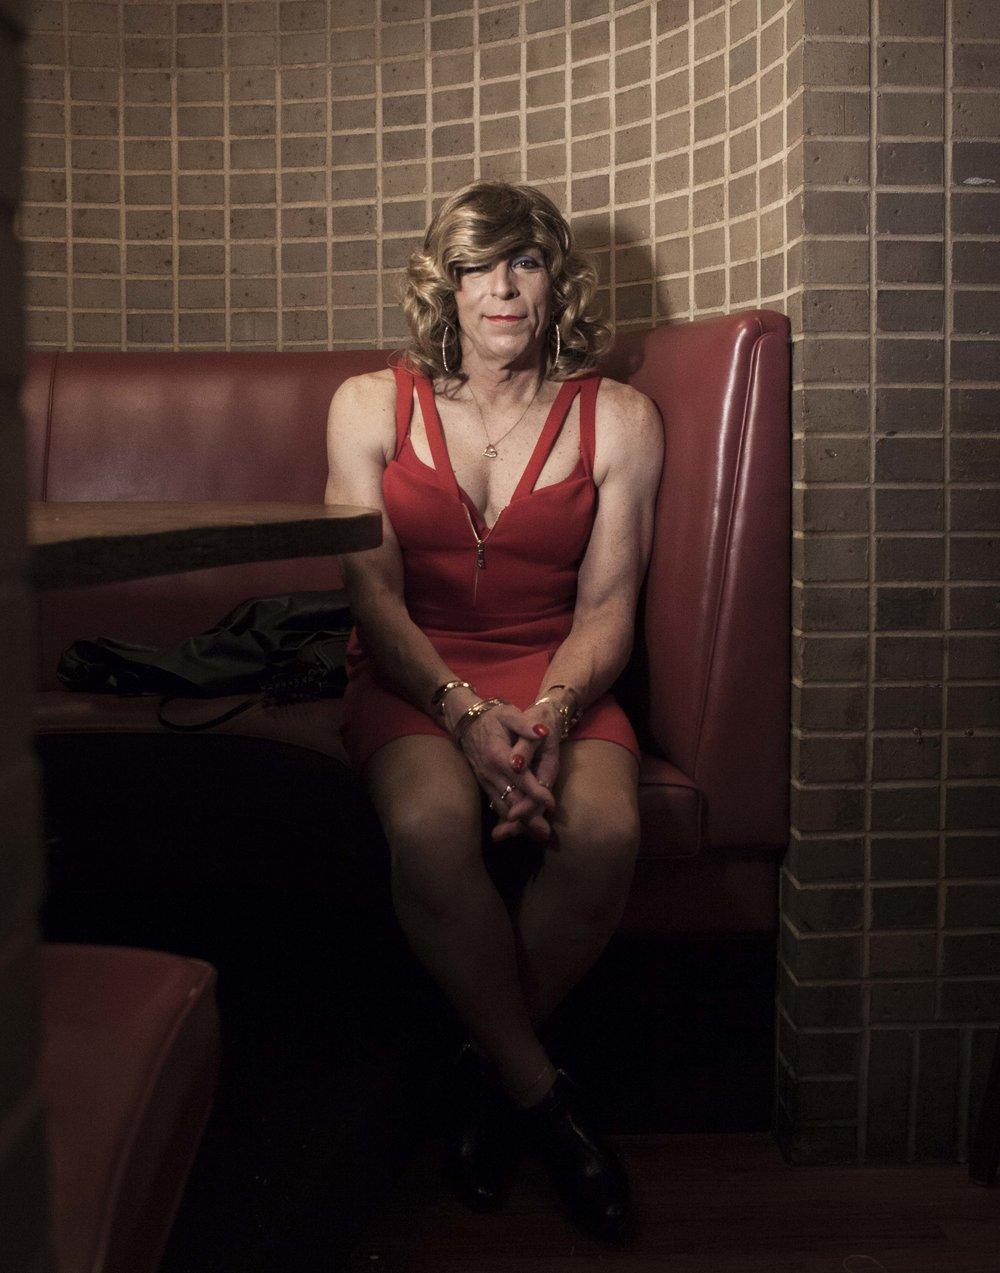 Susan, Age 60